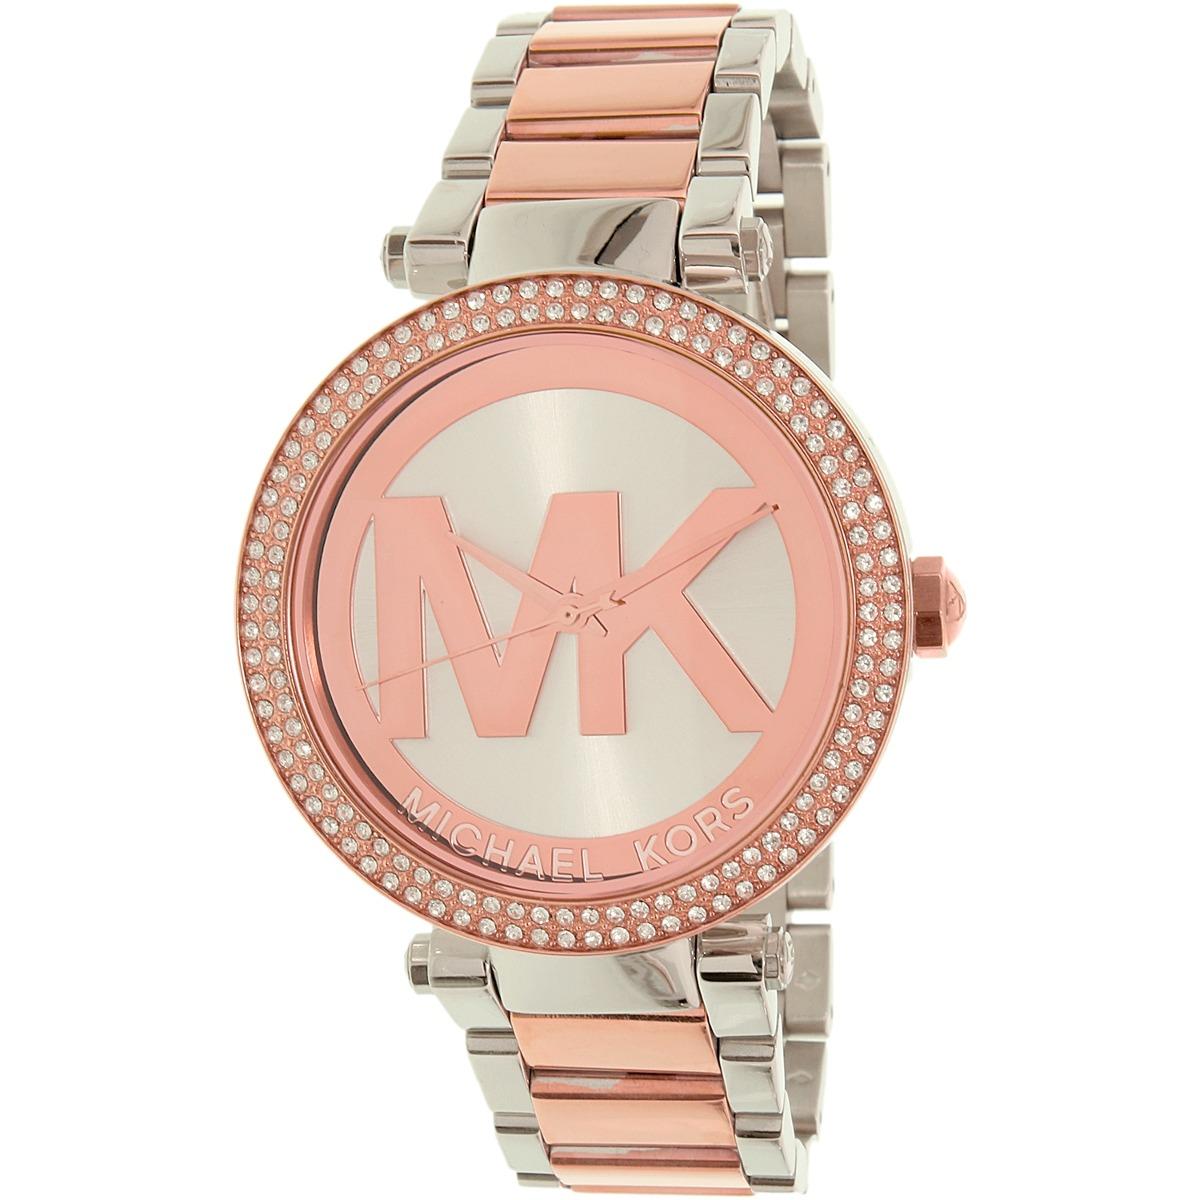 cd144db81244 reloj michael kors para mujer mk6314 parker color oro-rosa. Cargando zoom.